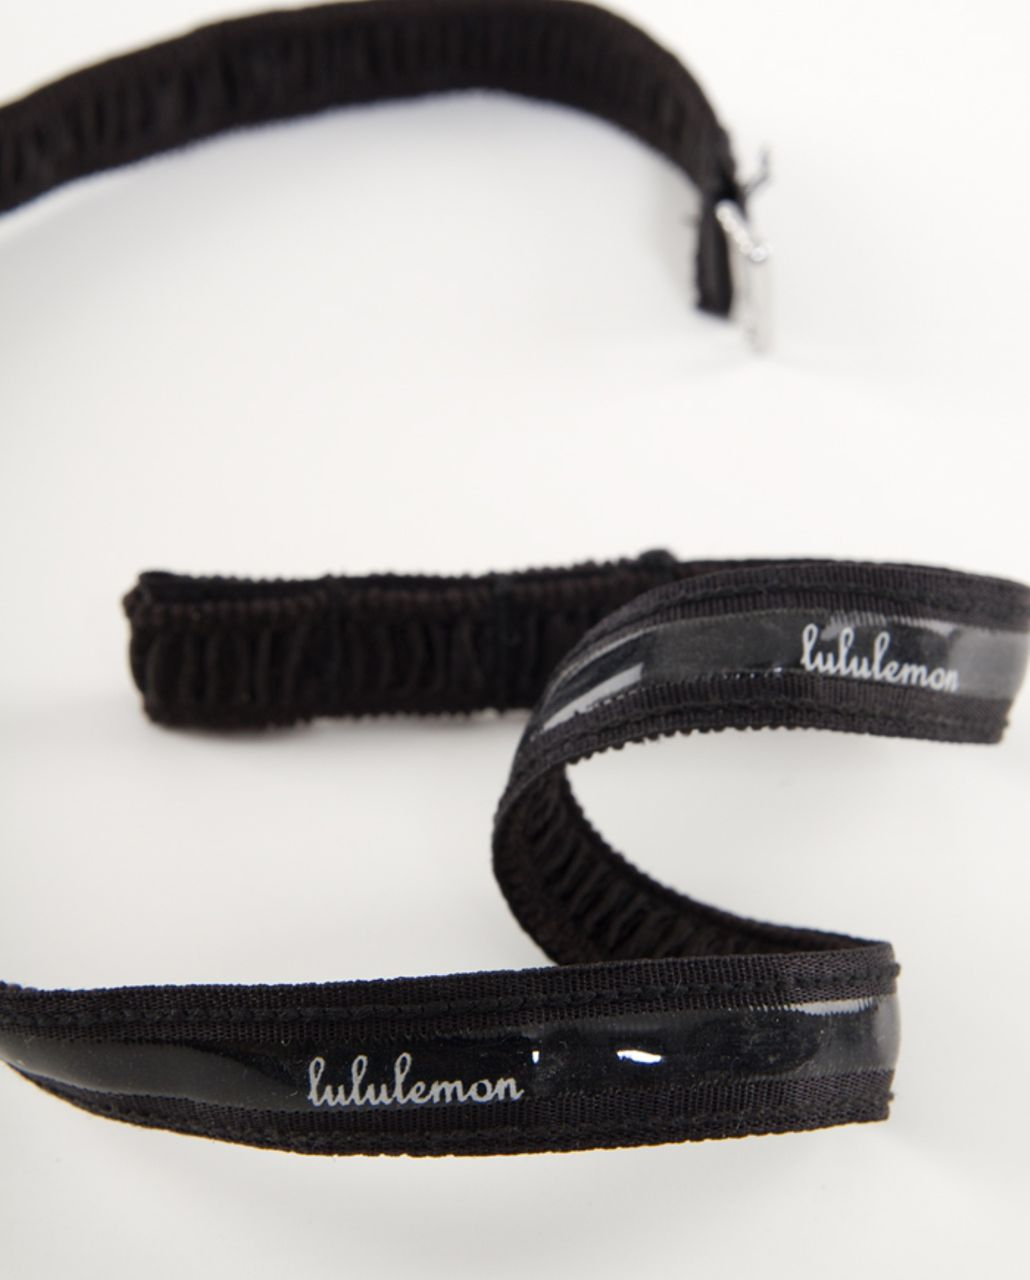 Lululemon Skinny Satin Pirouette *Special Edition - Black